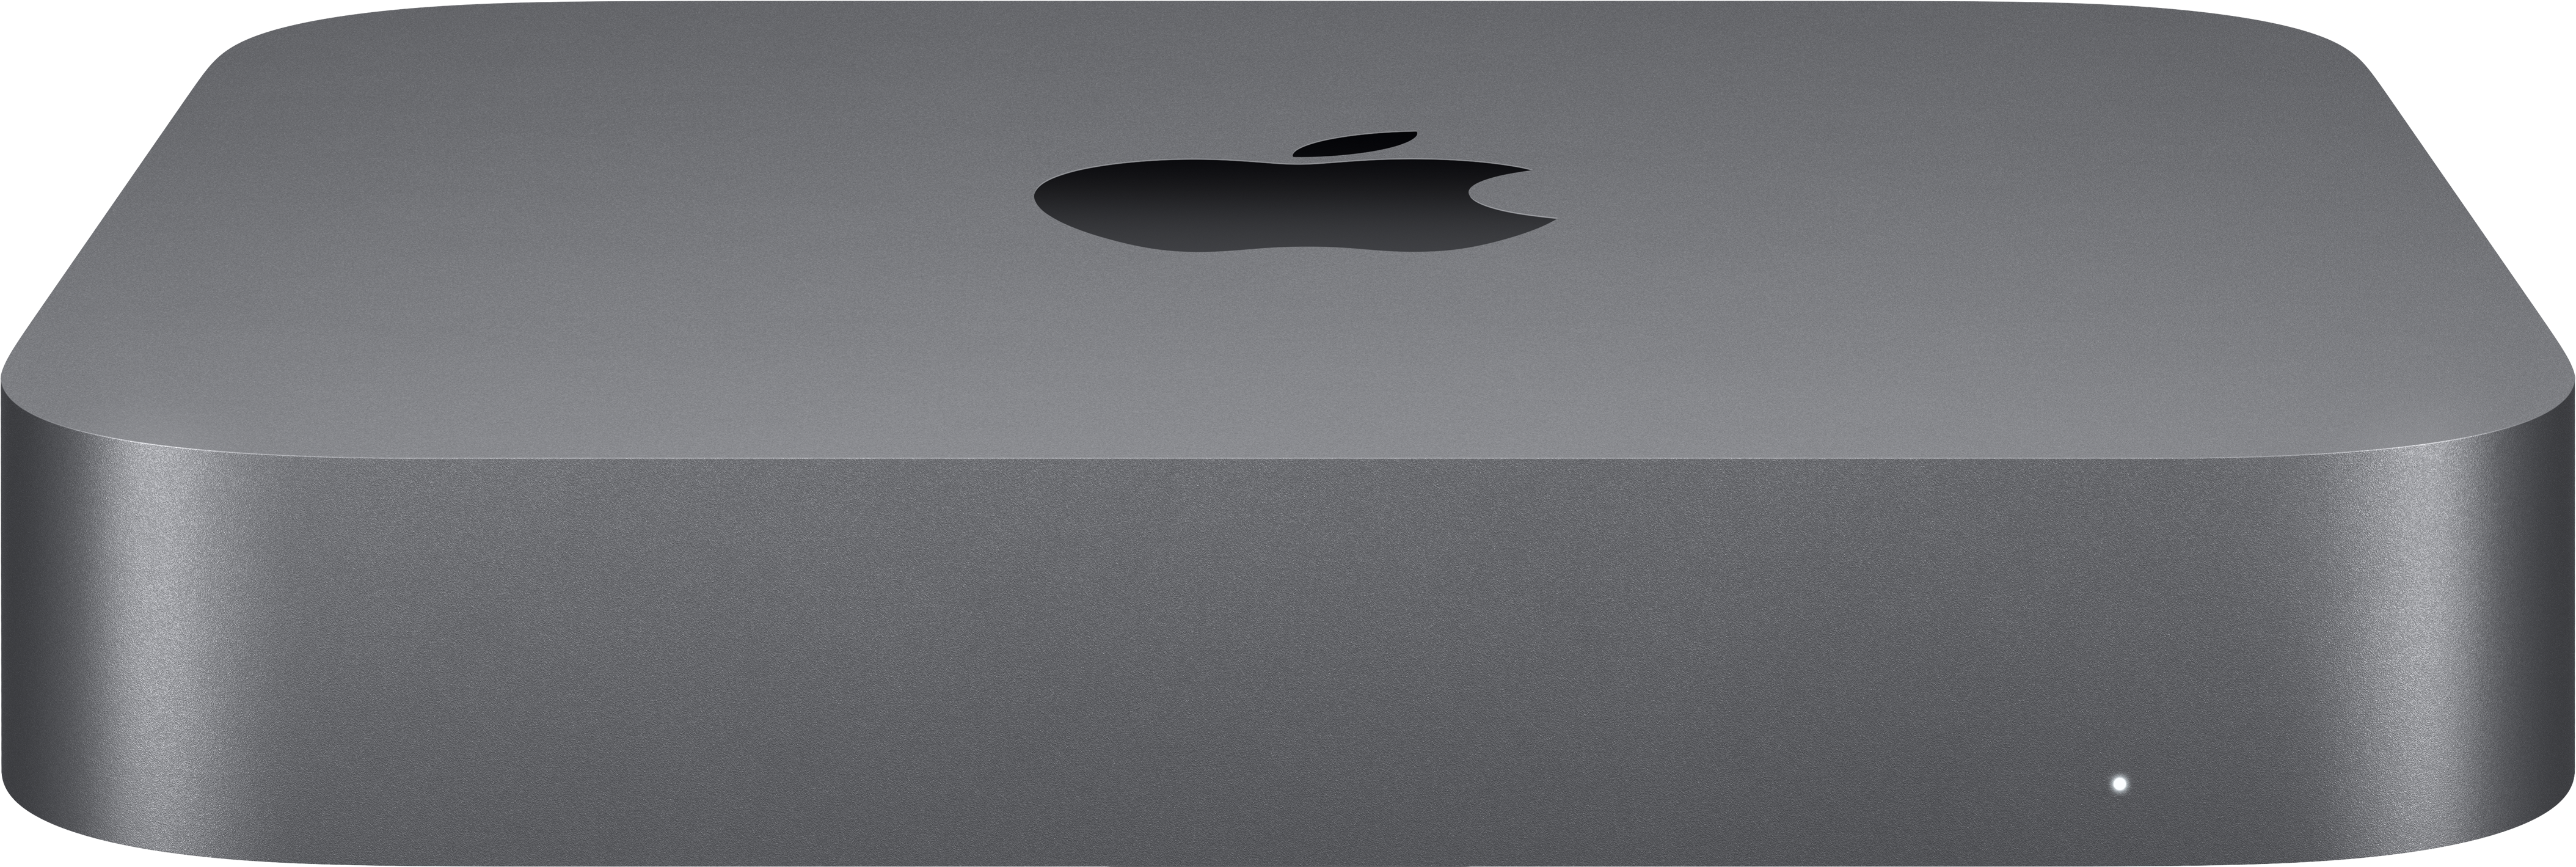 Mac mini, Intel Core i5, 8 ГБ,...